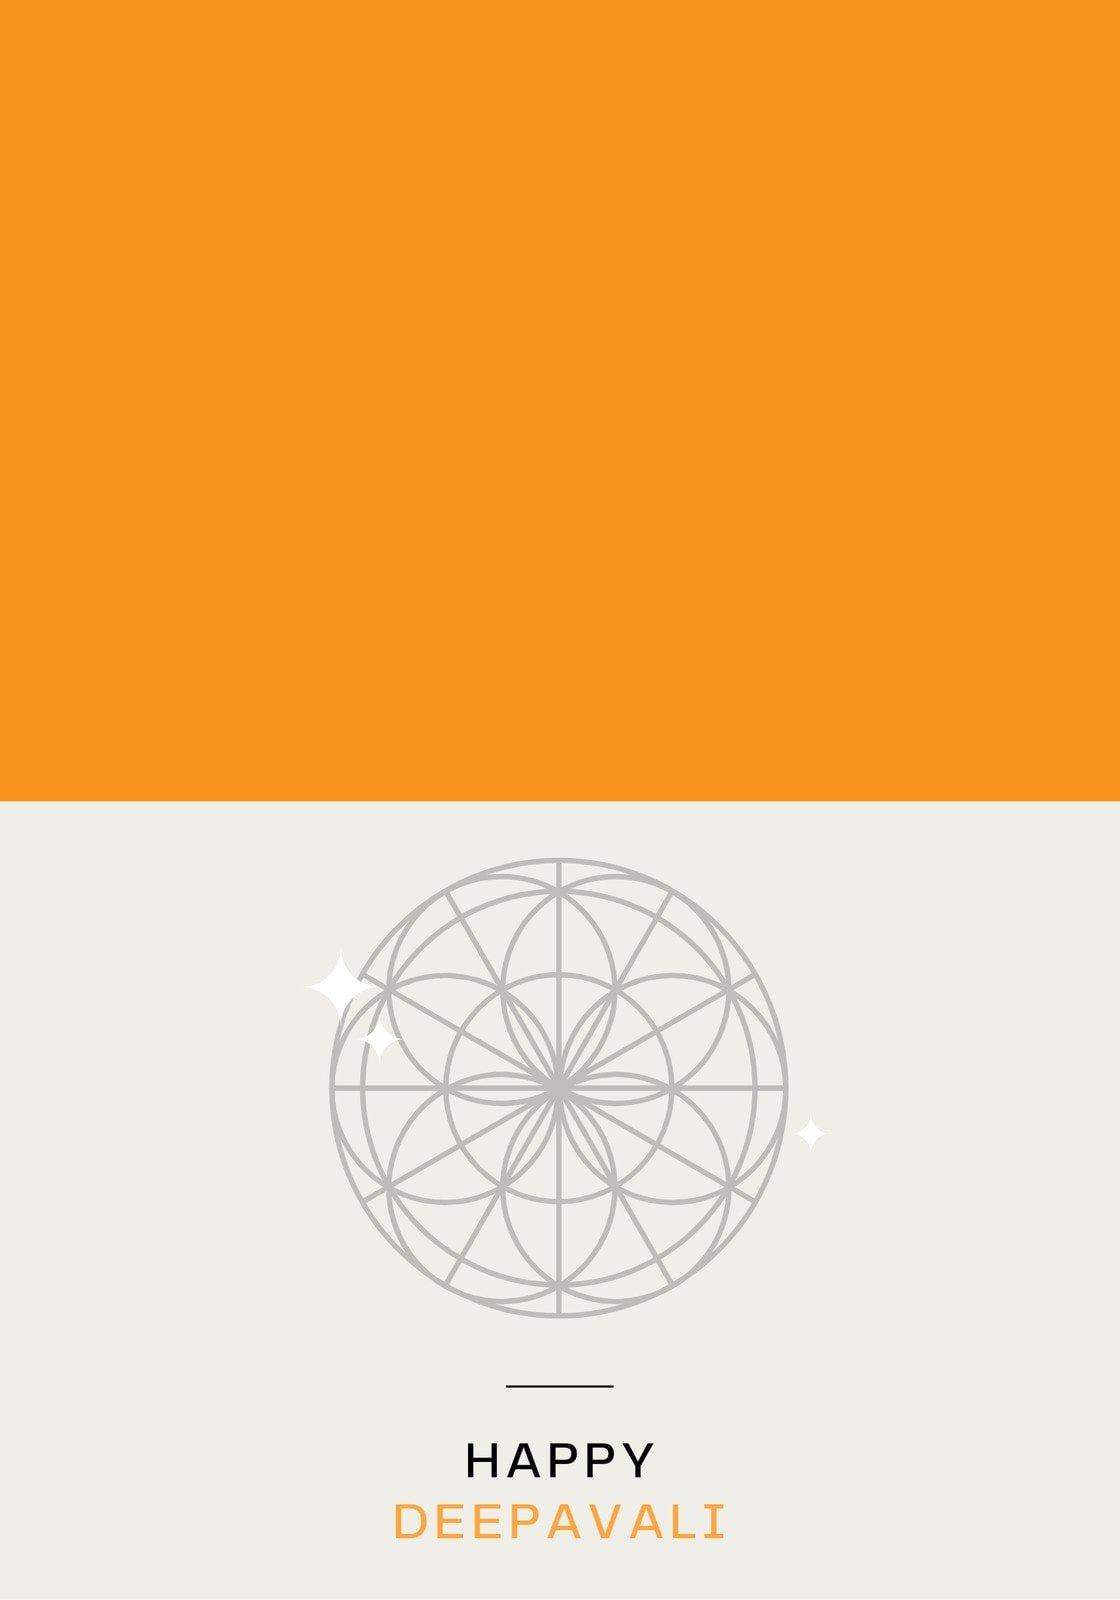 Orange and Ivory Geometric Flower Minimalist Diwali Folded Card